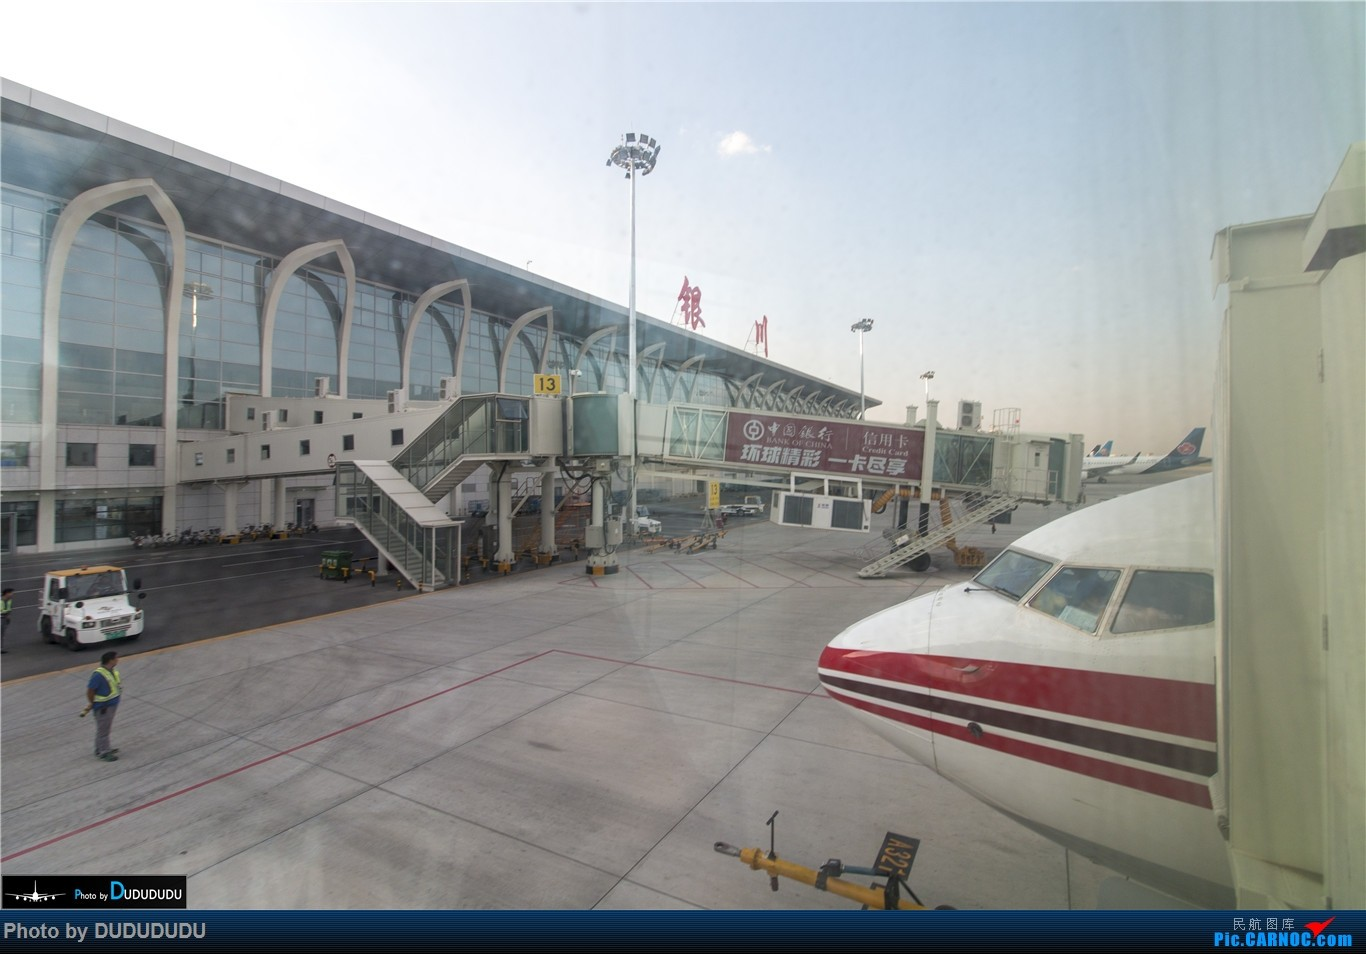 Re:[原创]【DUDUDUDU】暑期飞行合集 从A388到MA60 BOEING 737-800 B-7563 中国银川河东国际机场